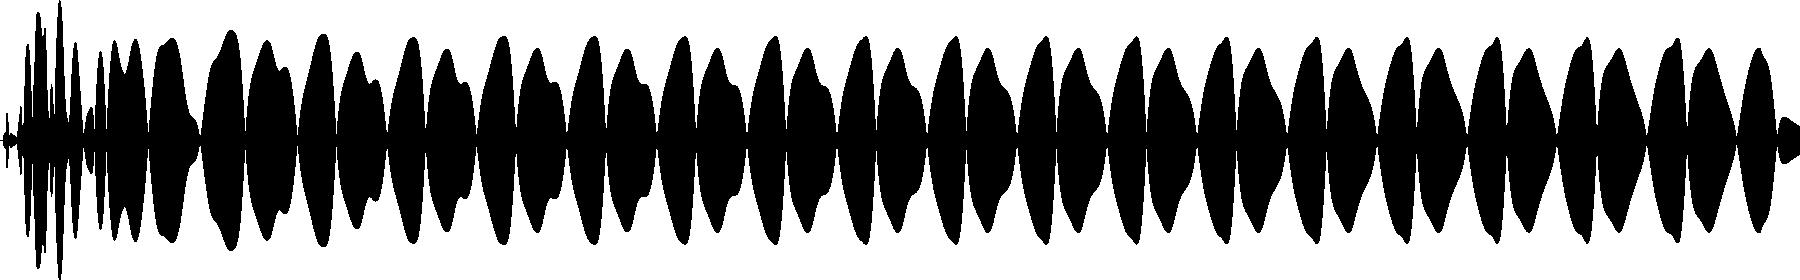 vedh bass cut 139 g